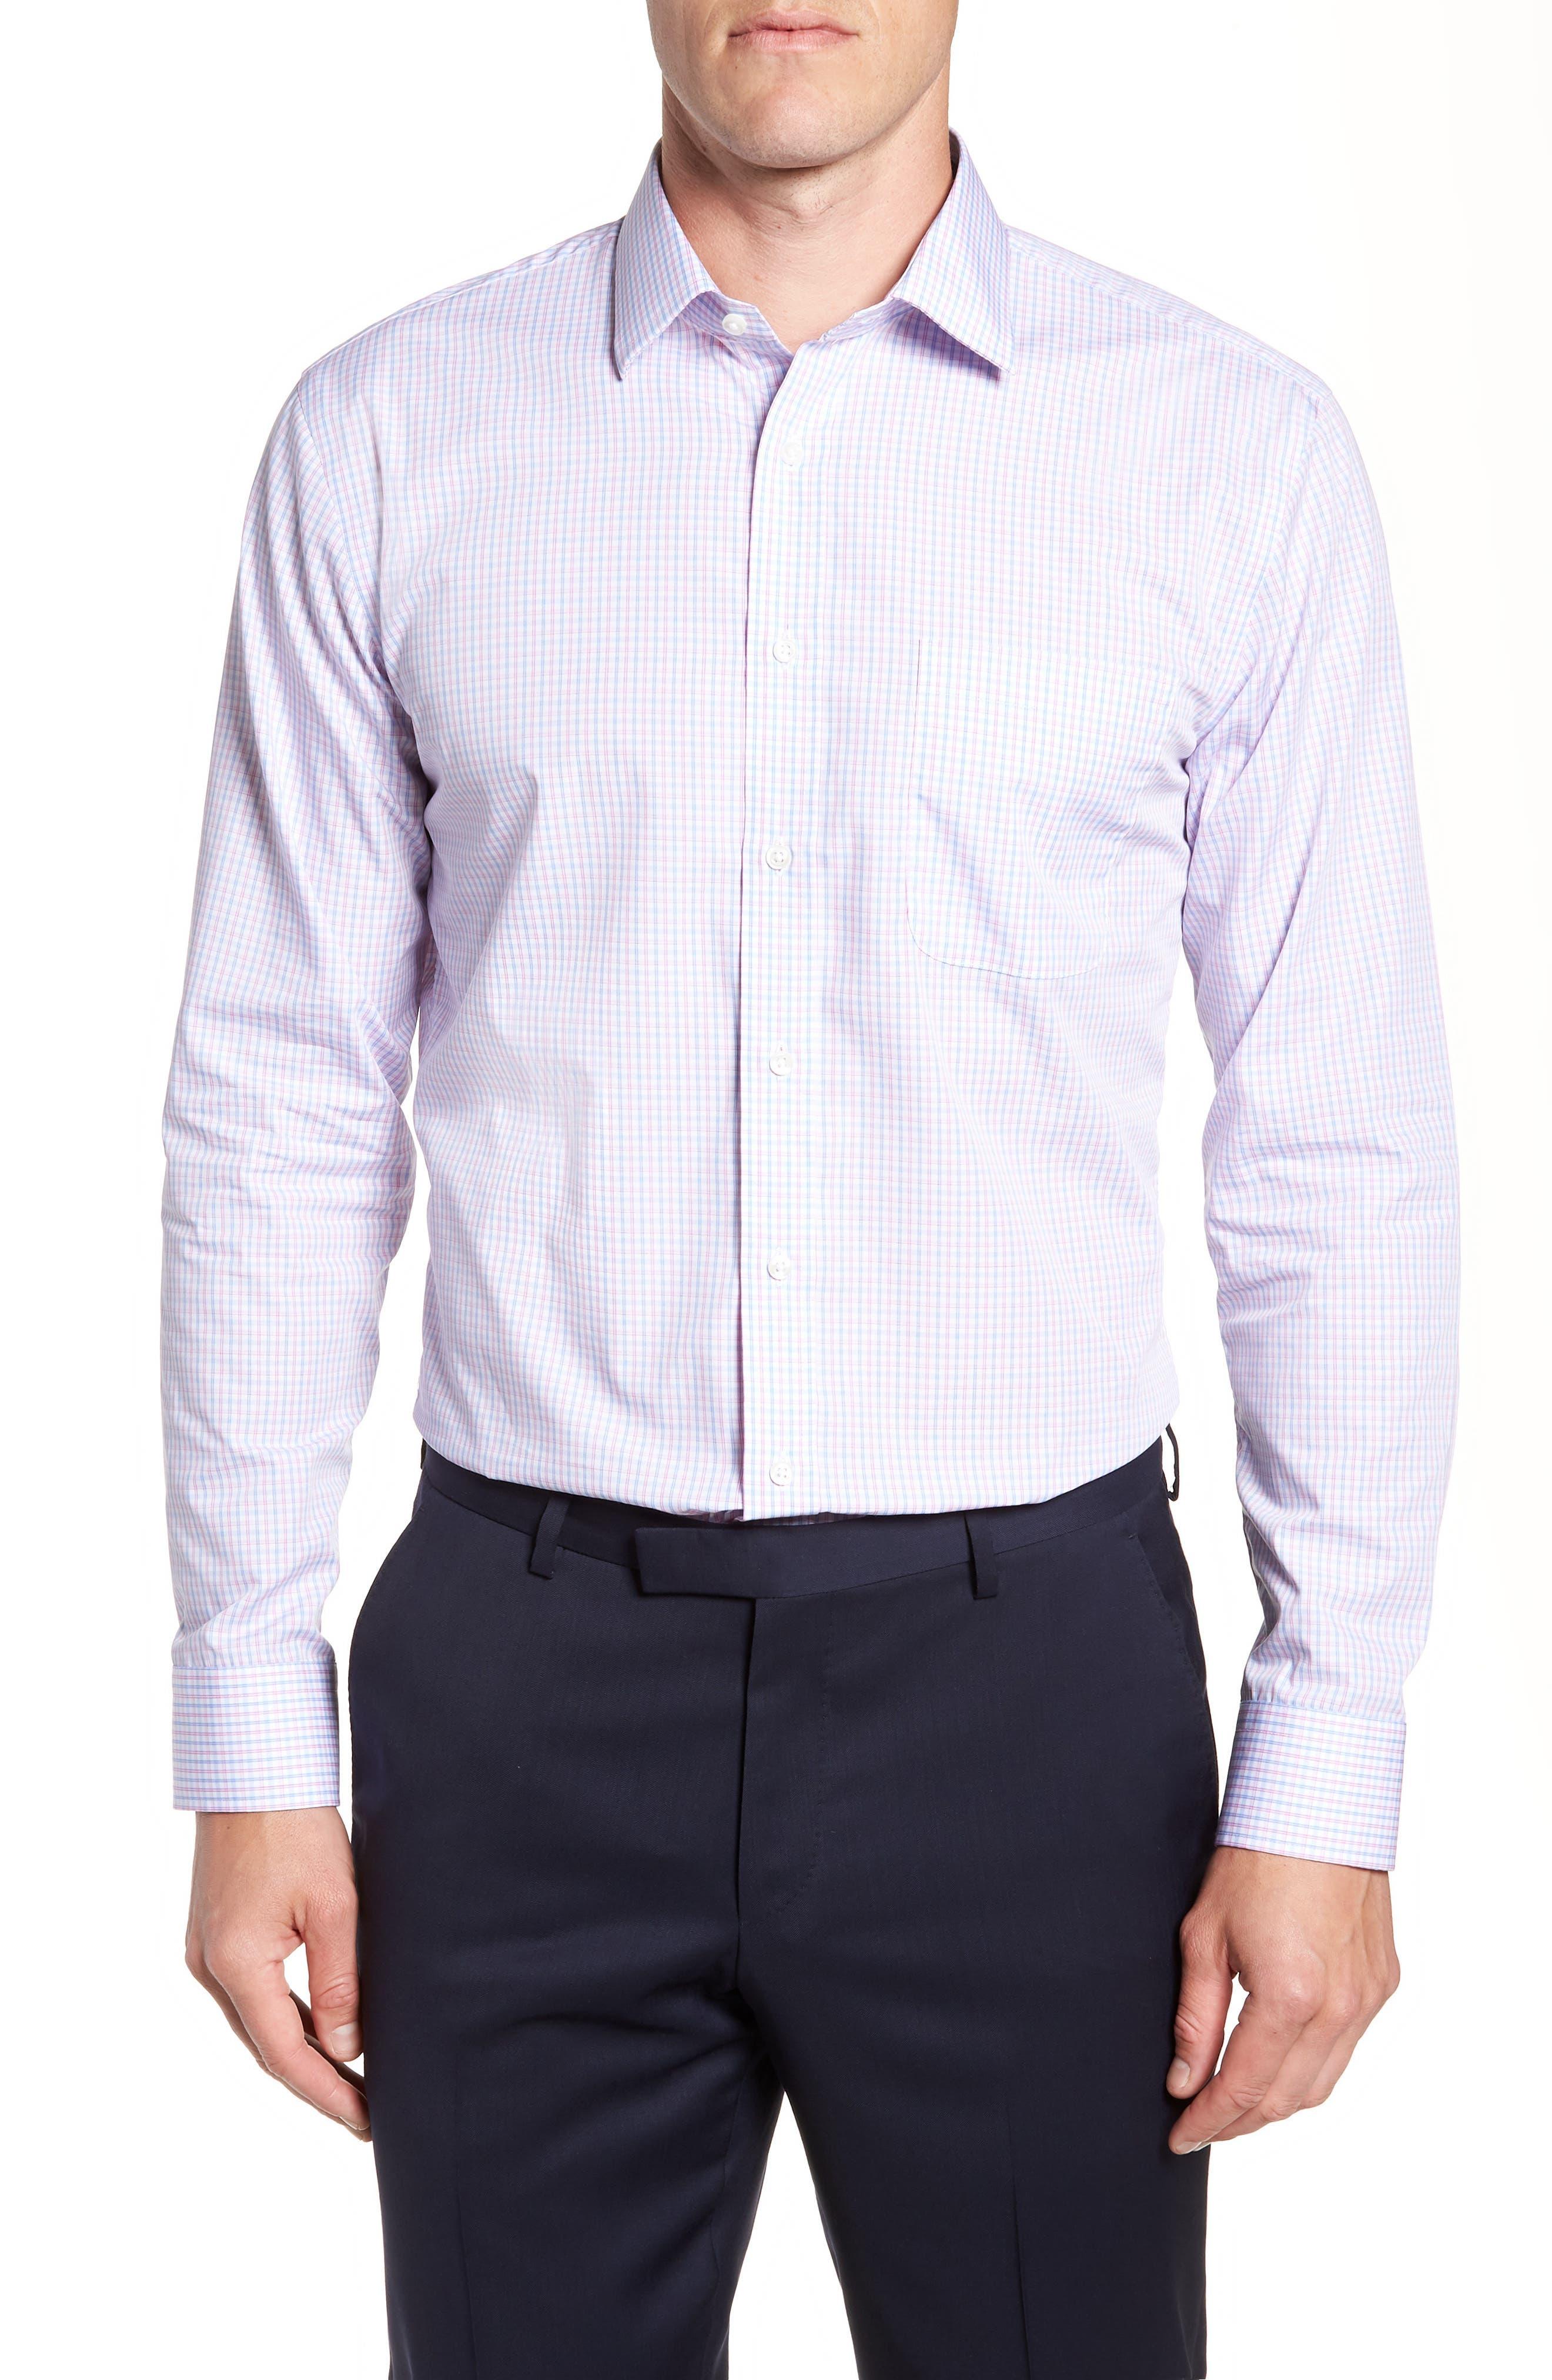 Nordstrom Trim Fit Non-Iron Check Dress Shirt,                             Main thumbnail 1, color,                             Pink Carmine